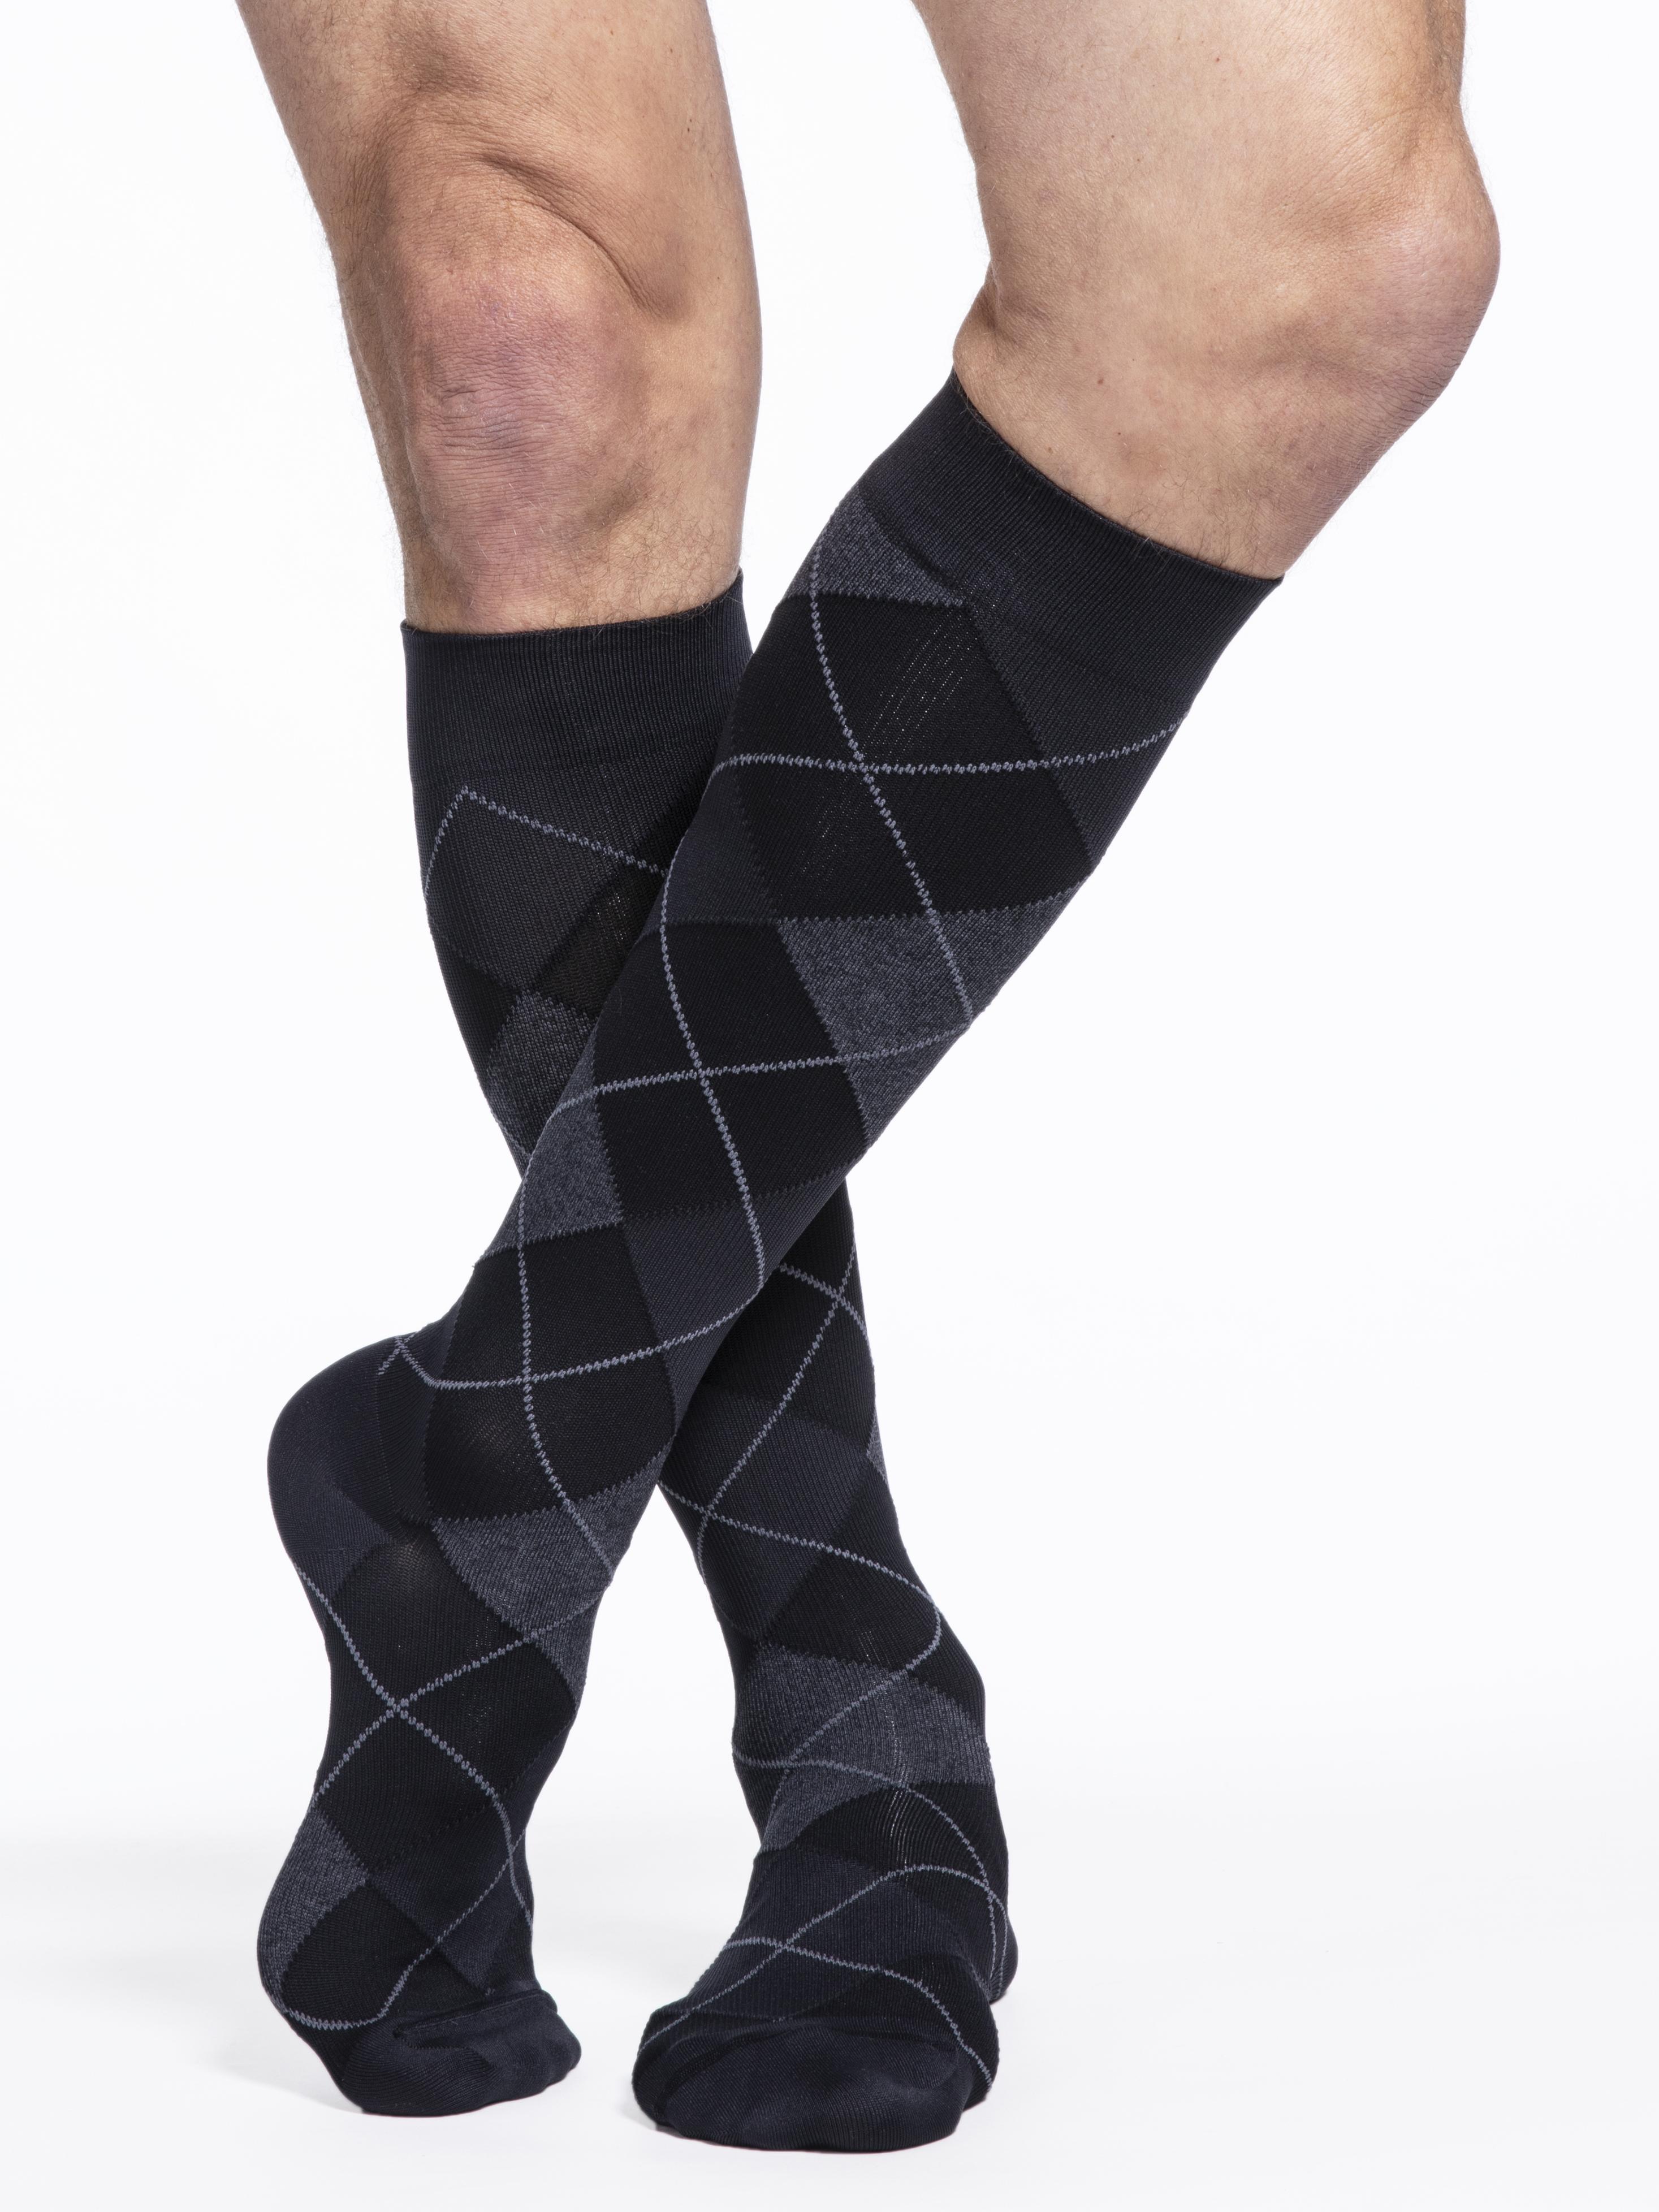 Men's Microfiber Shades Calf Onyx Argyle 6.5 - 8.5